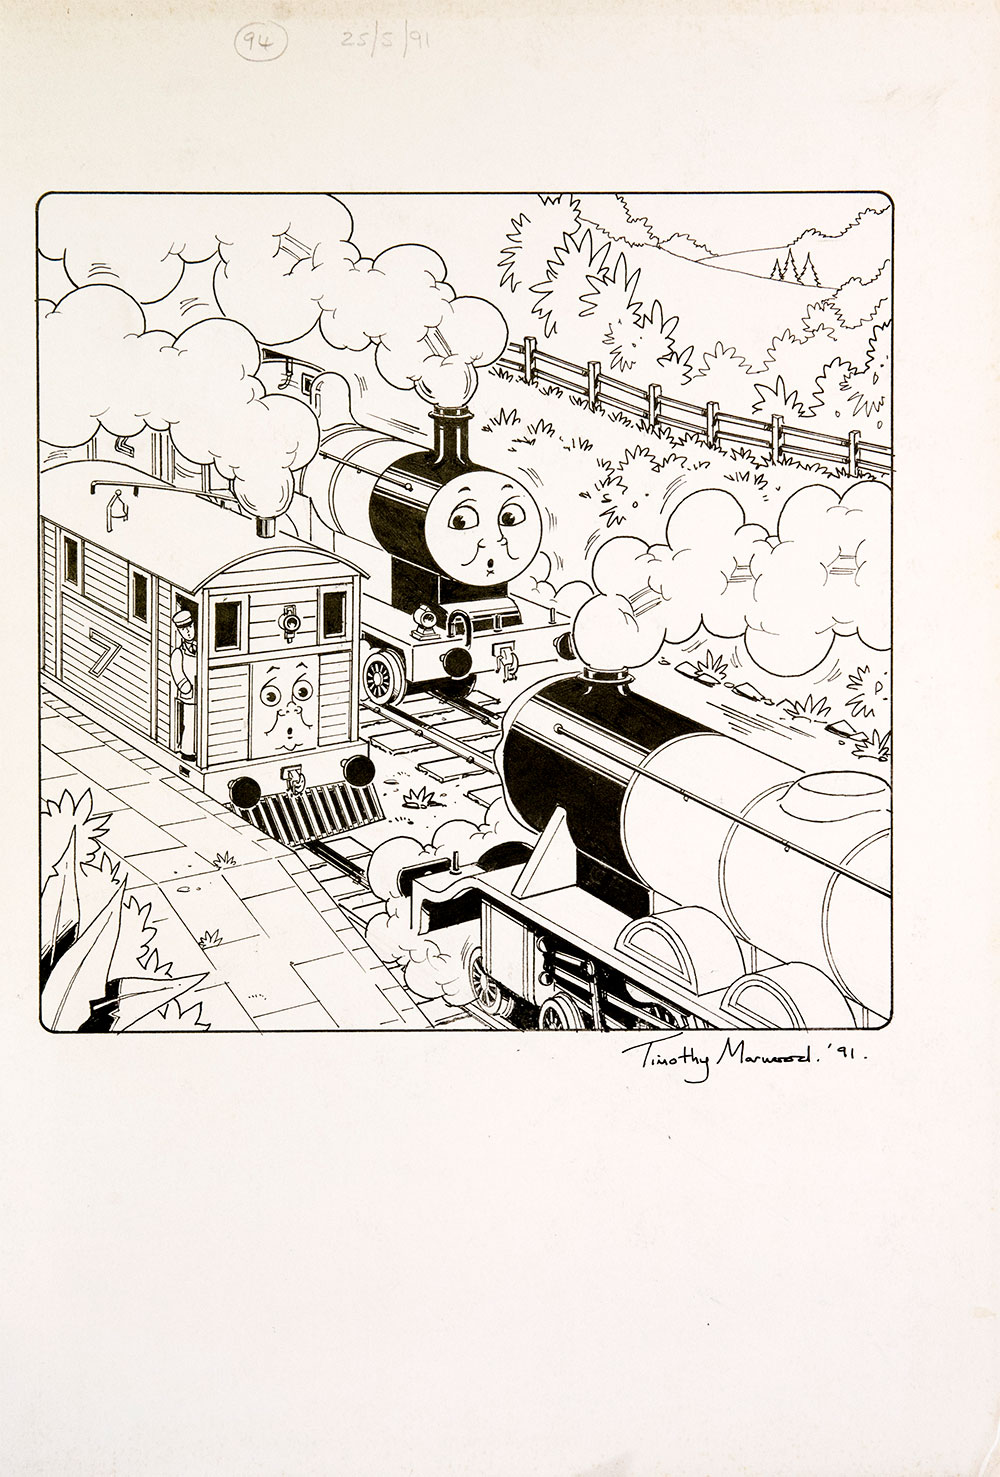 Issue #94 (1991) - Thomas the Tank Engine [146/160]